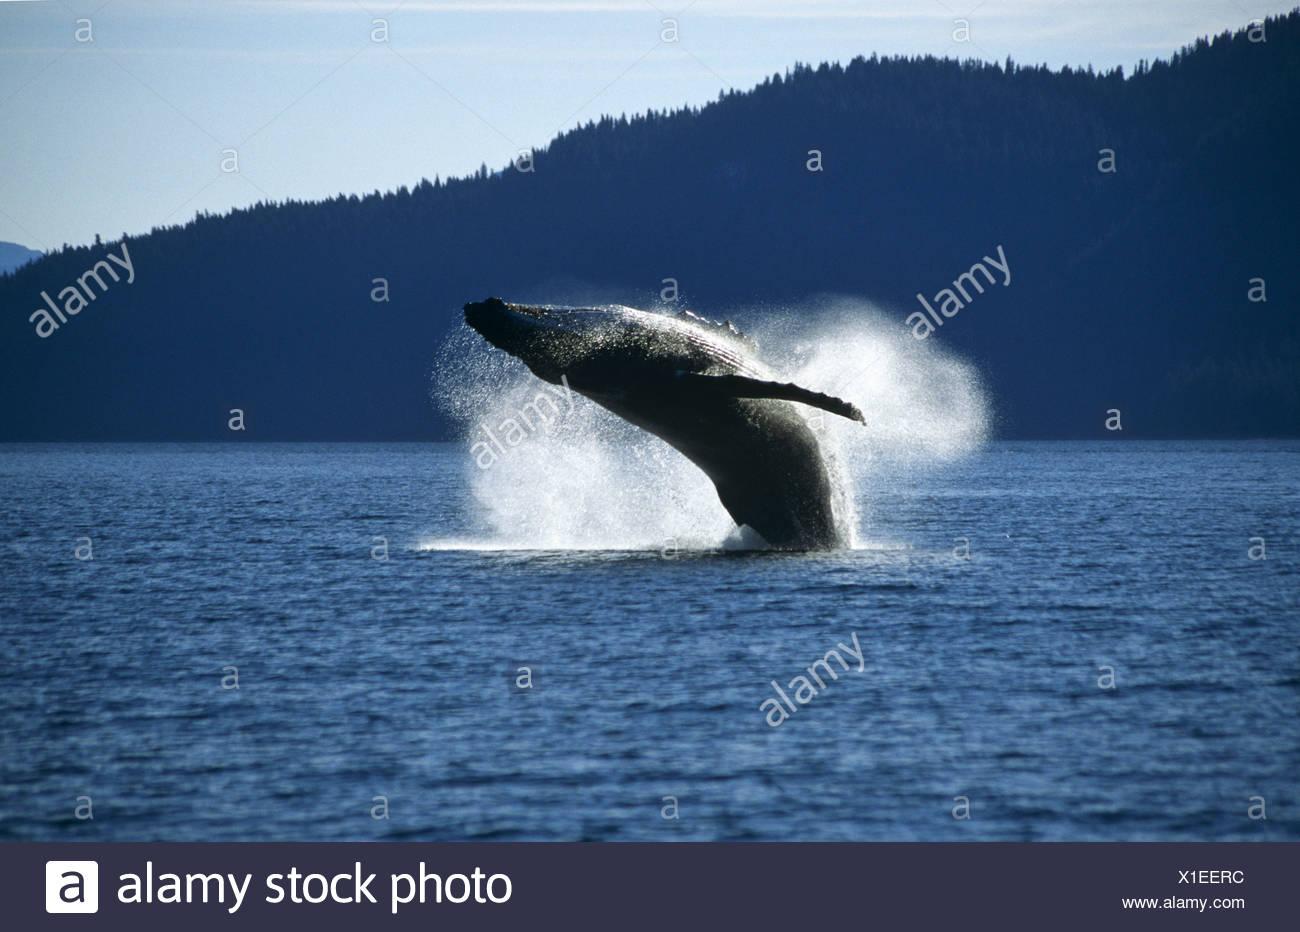 Humpback Whale breaching, Tenakee Inlet, Southeast. Alaska - Stock Image